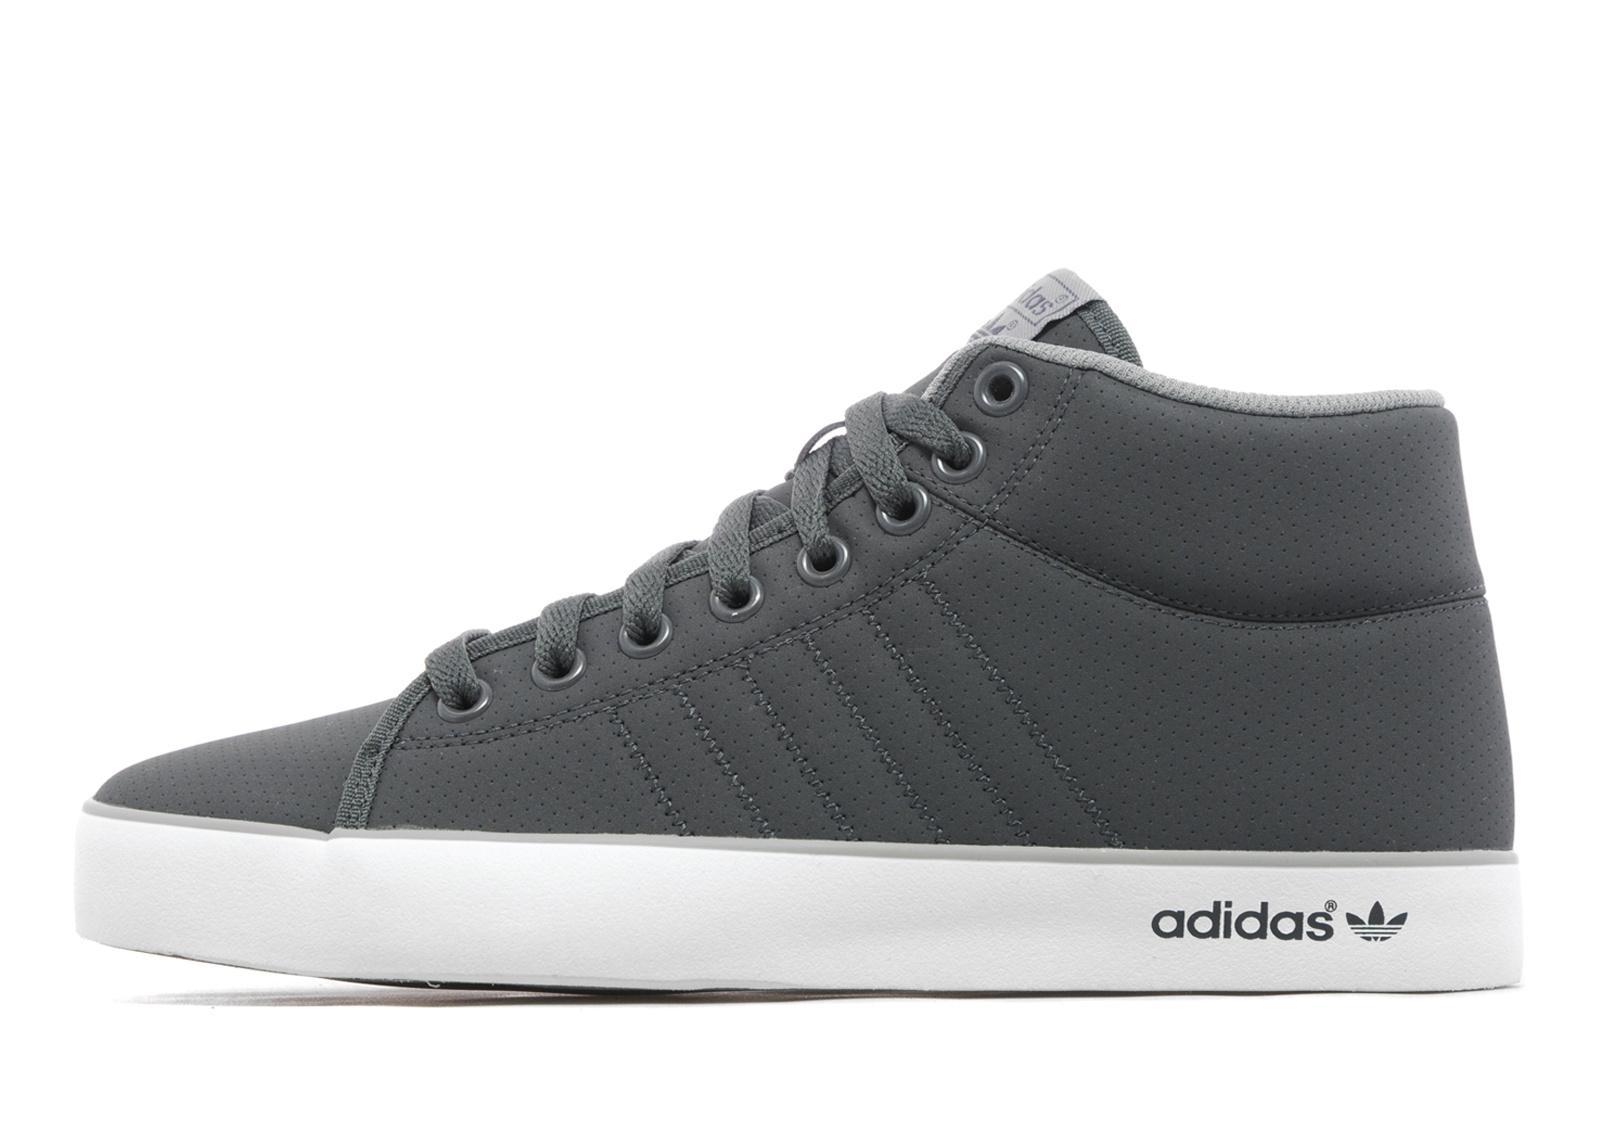 adidas tennis mid